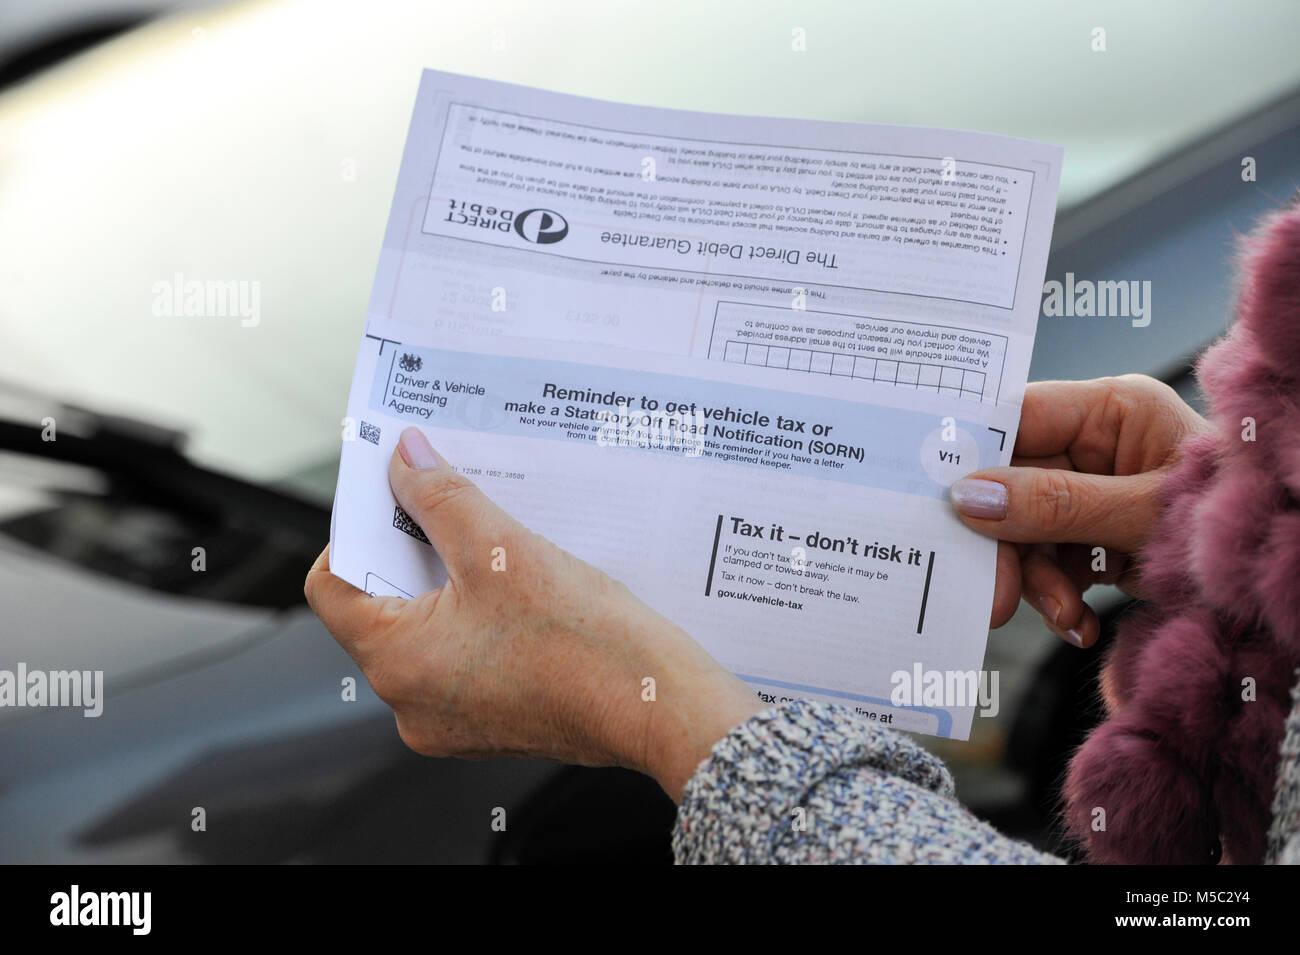 Woman checking her DVLA car vehicle Tax Renewal reminder notice - Stock Image